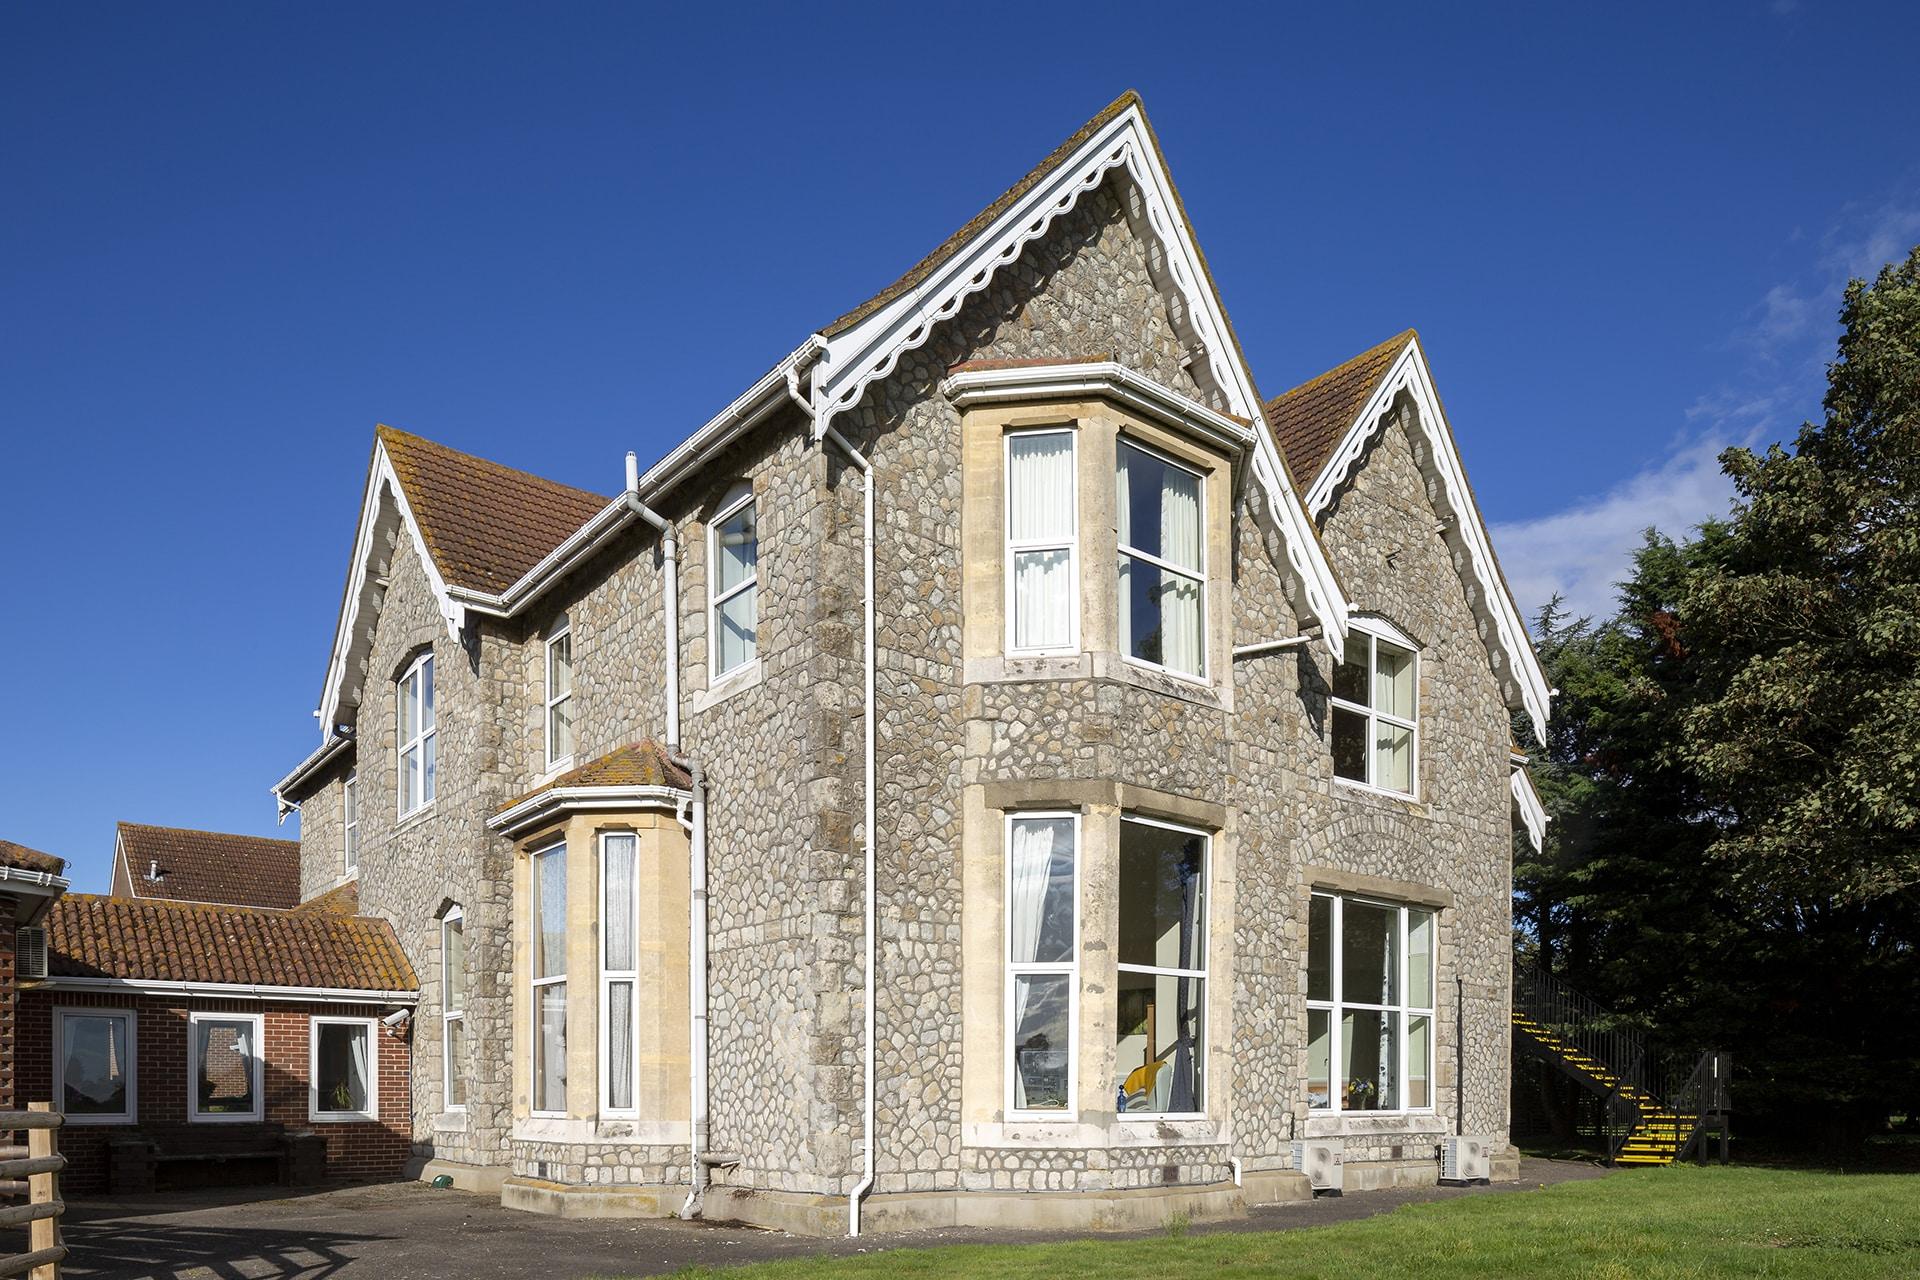 Stambridge Meadows Care Home rear elevation